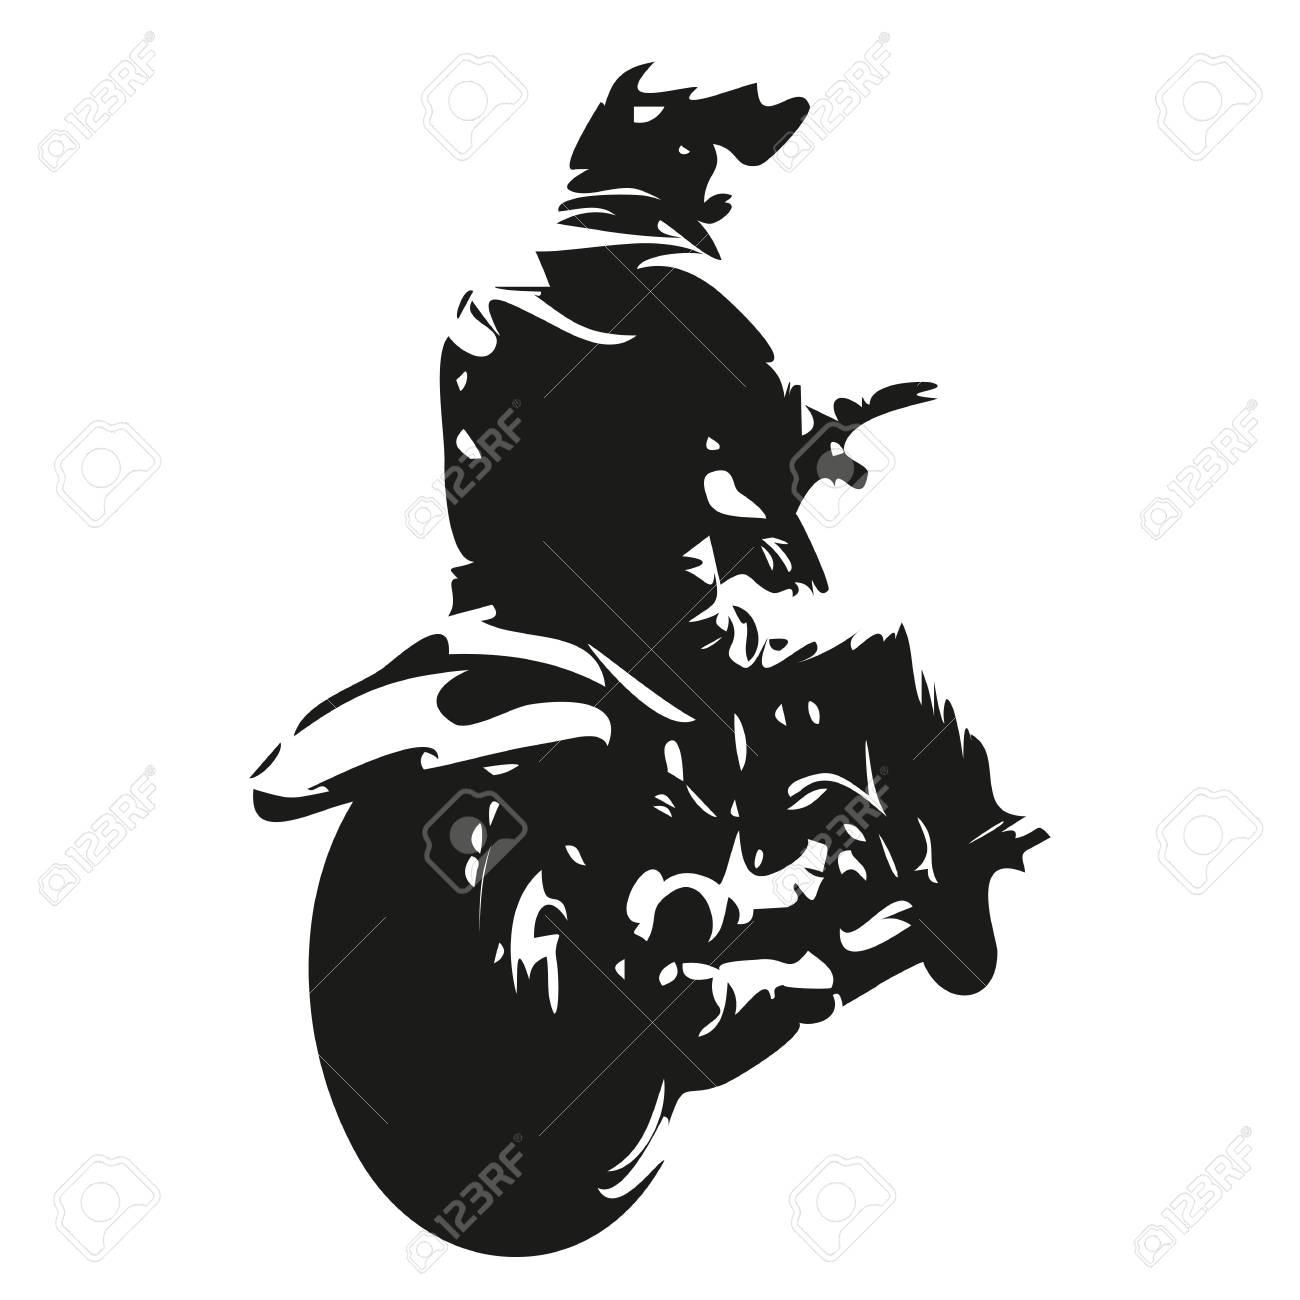 Chopper Motorbike, Motorcycle Rider Abstract Vector Illustration Stock  Vector   55397354